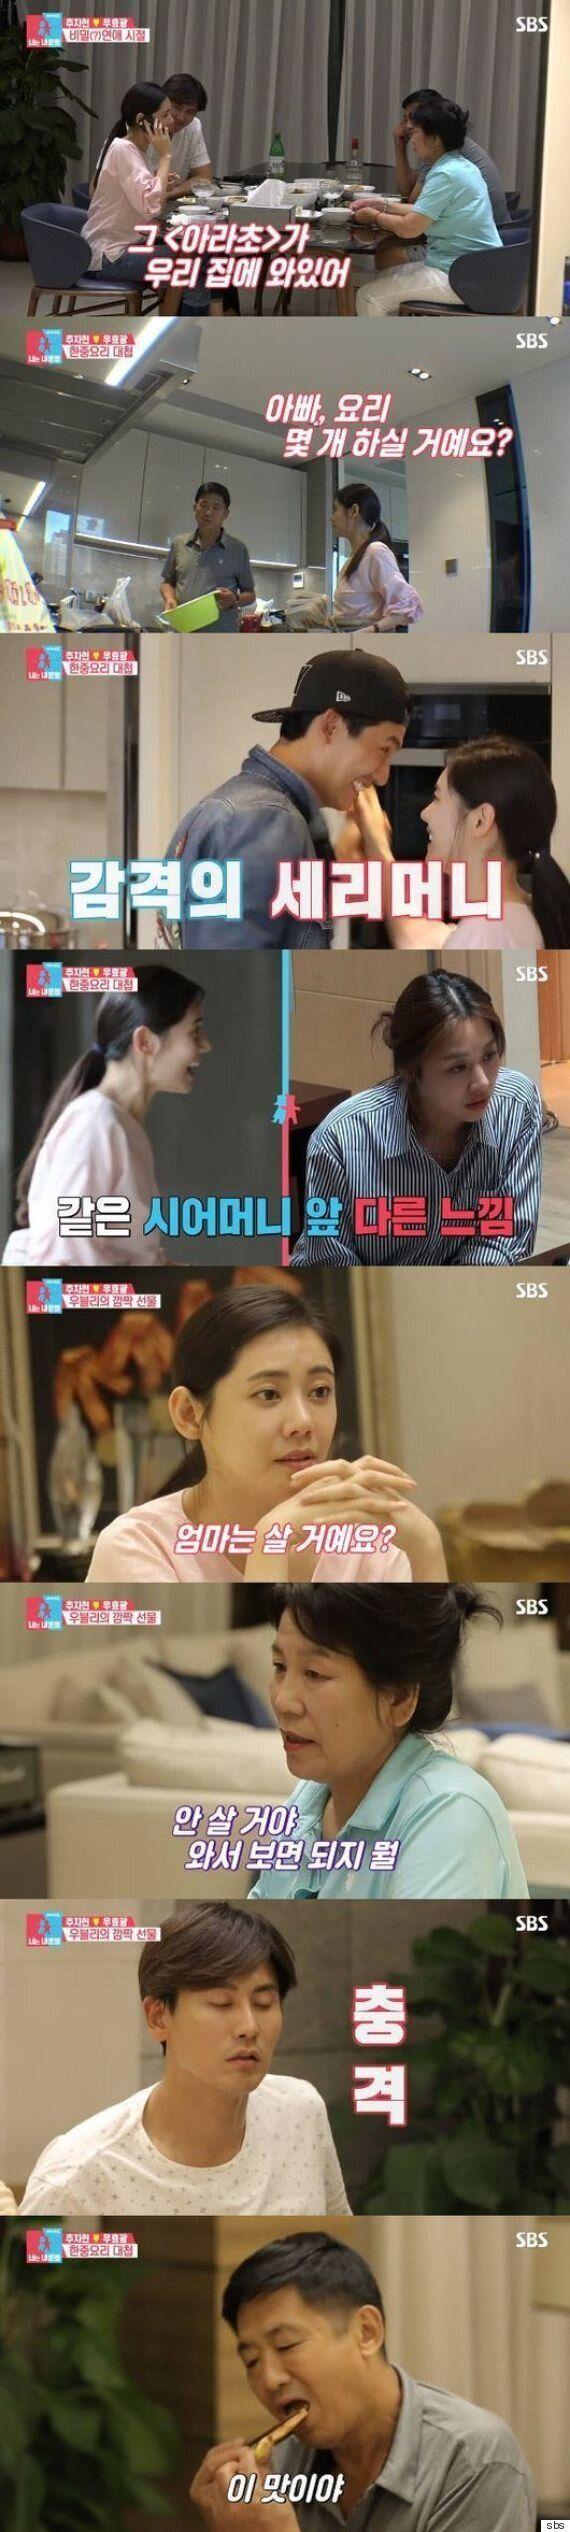 [TV톡톡] '동상2' 추자현, 명절 음식은 시아빠와(ft. 우블리네